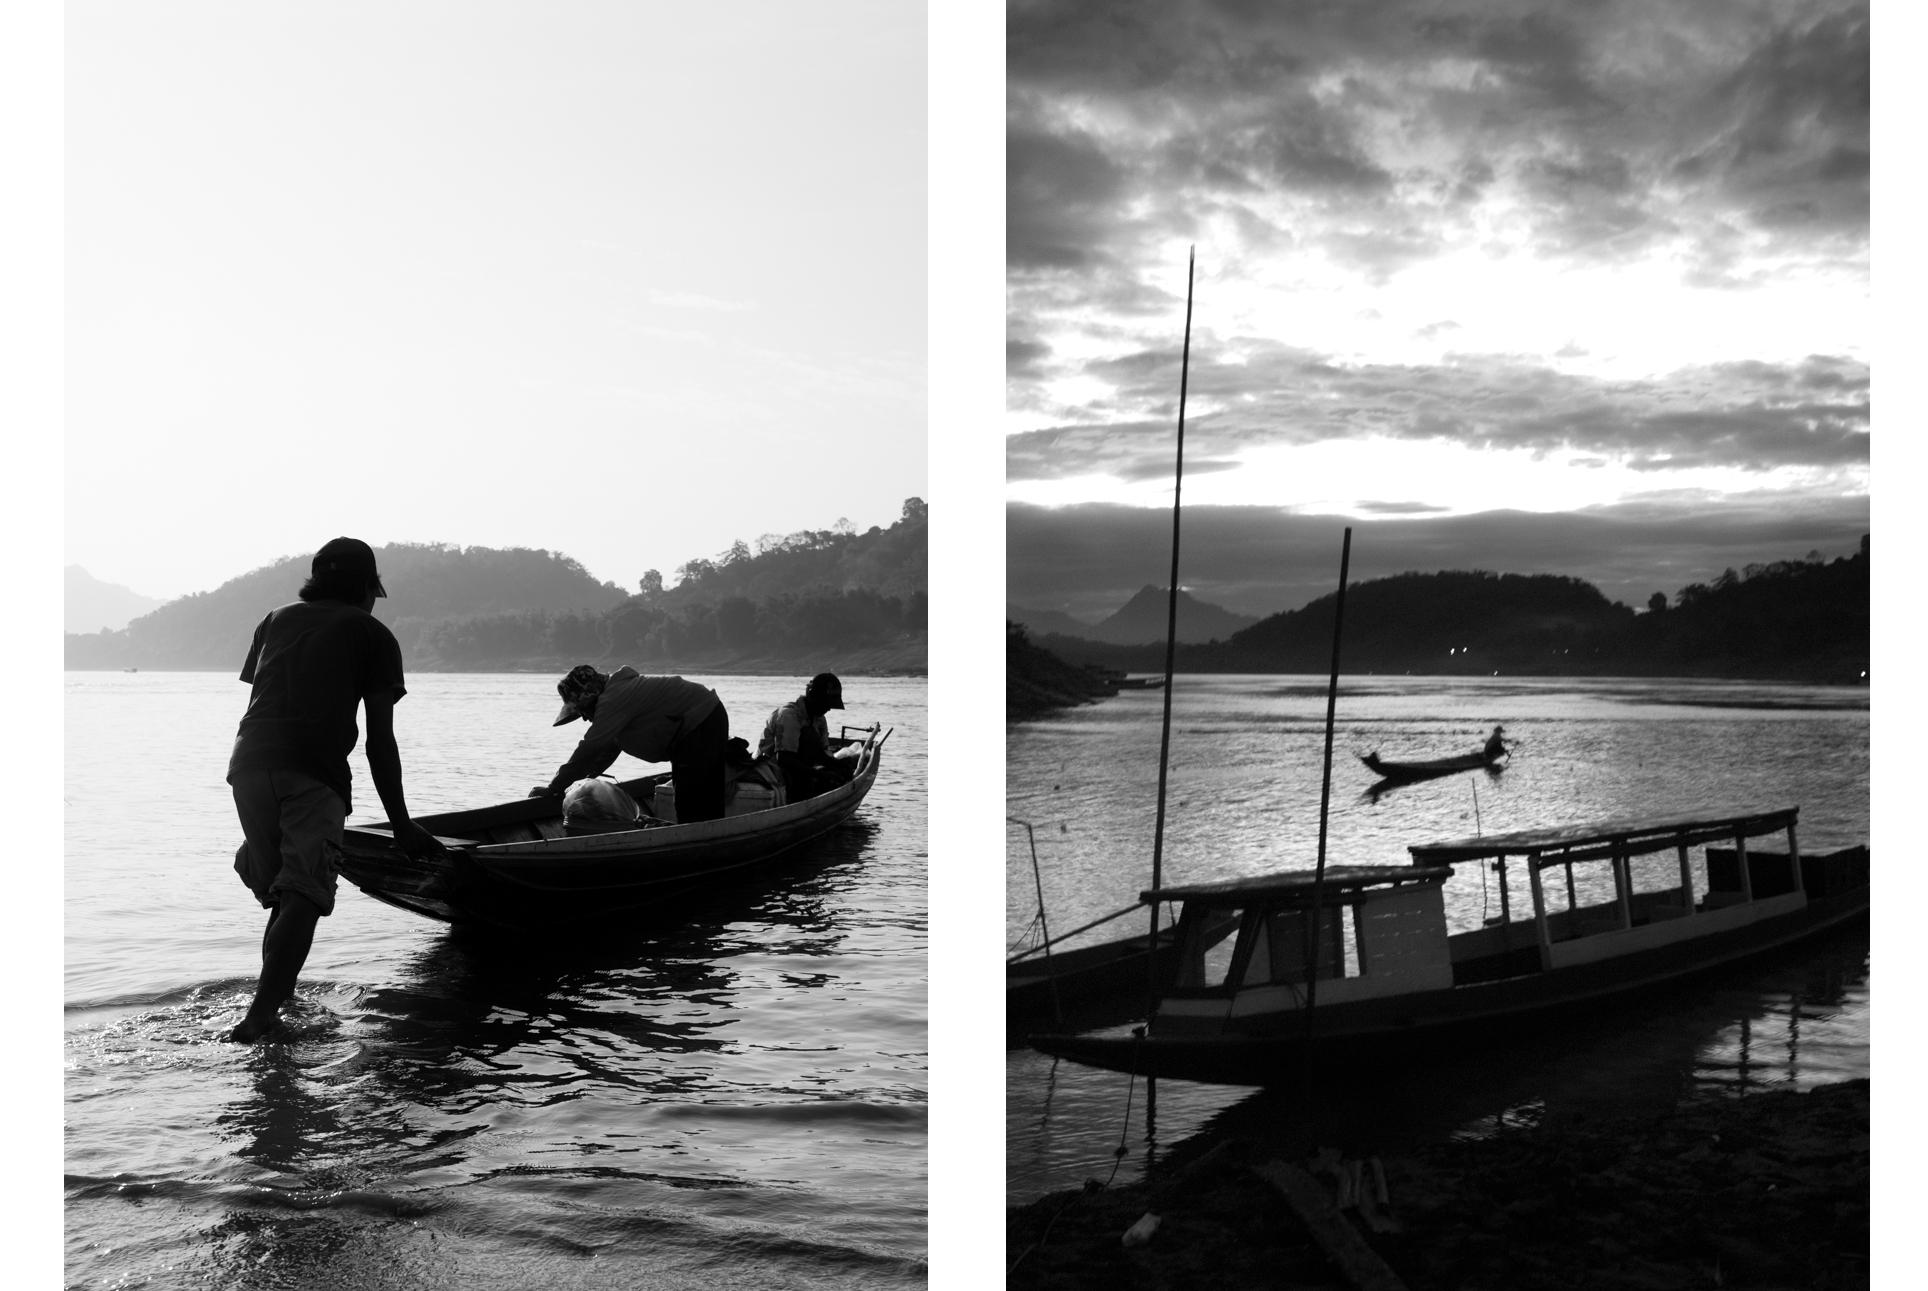 Reportage, Mekong river, boats